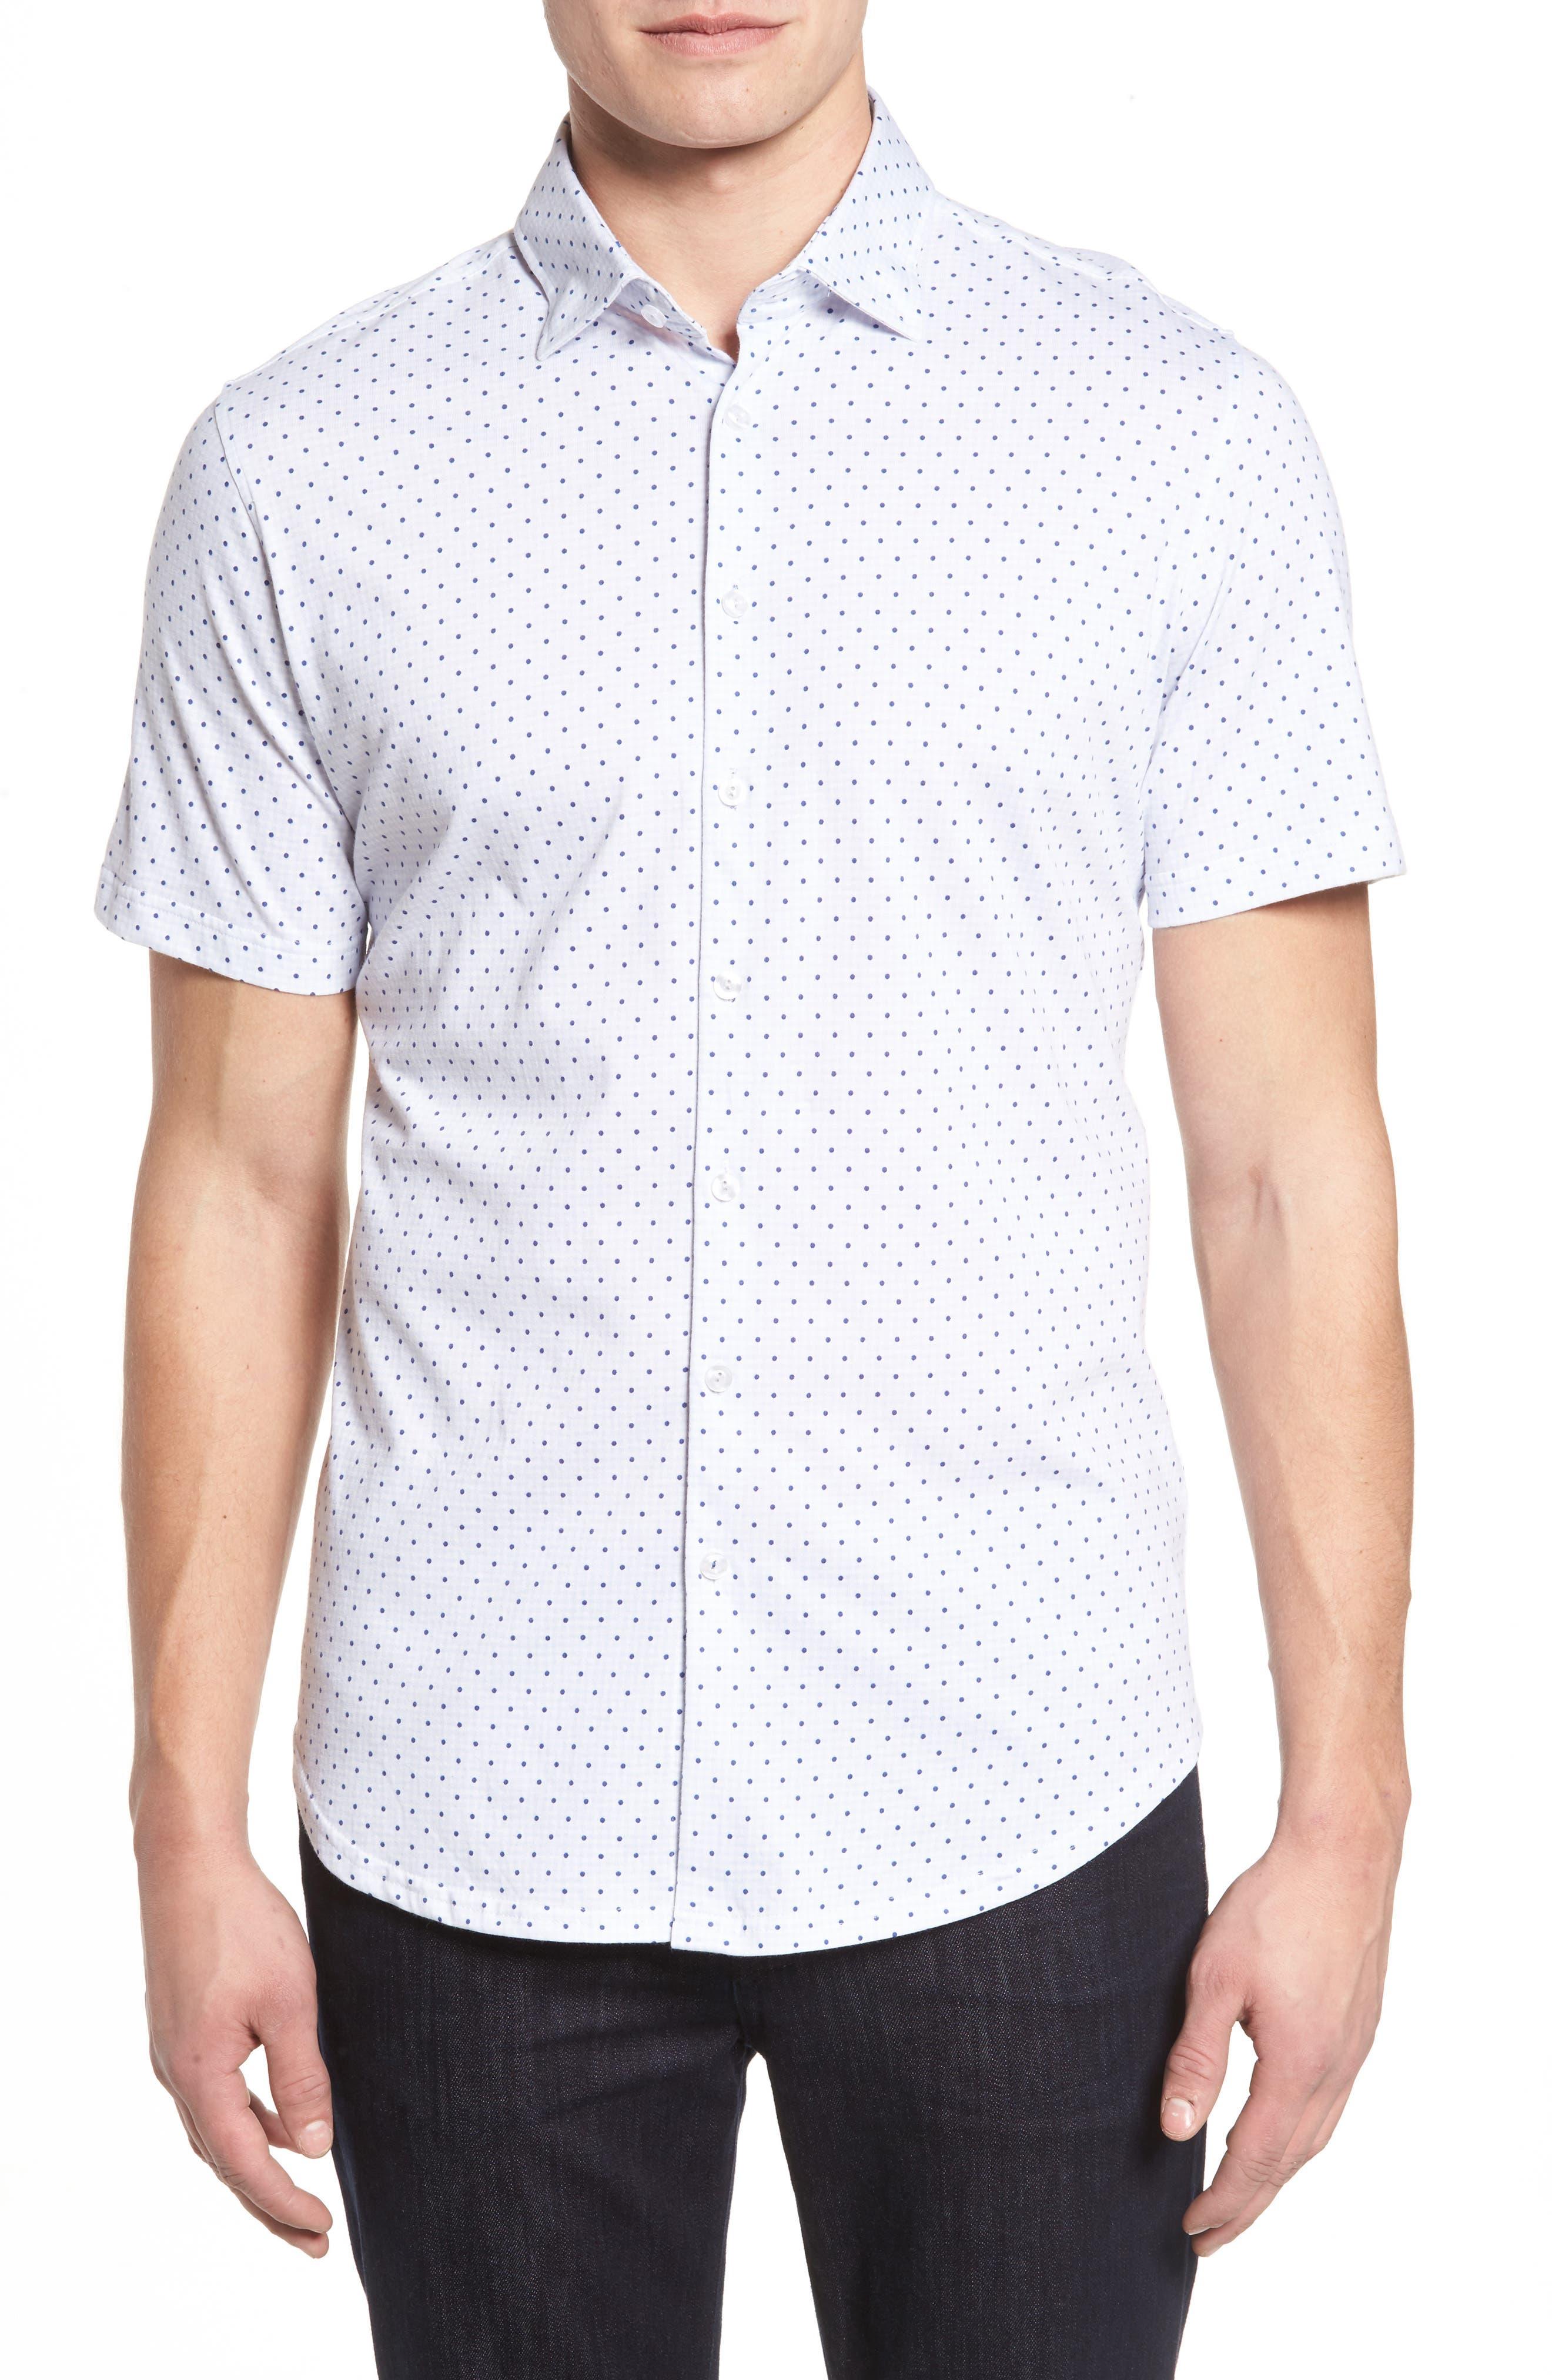 Main Image - Stone Rose Trim Fit Polka Dot Check Sport Shirt